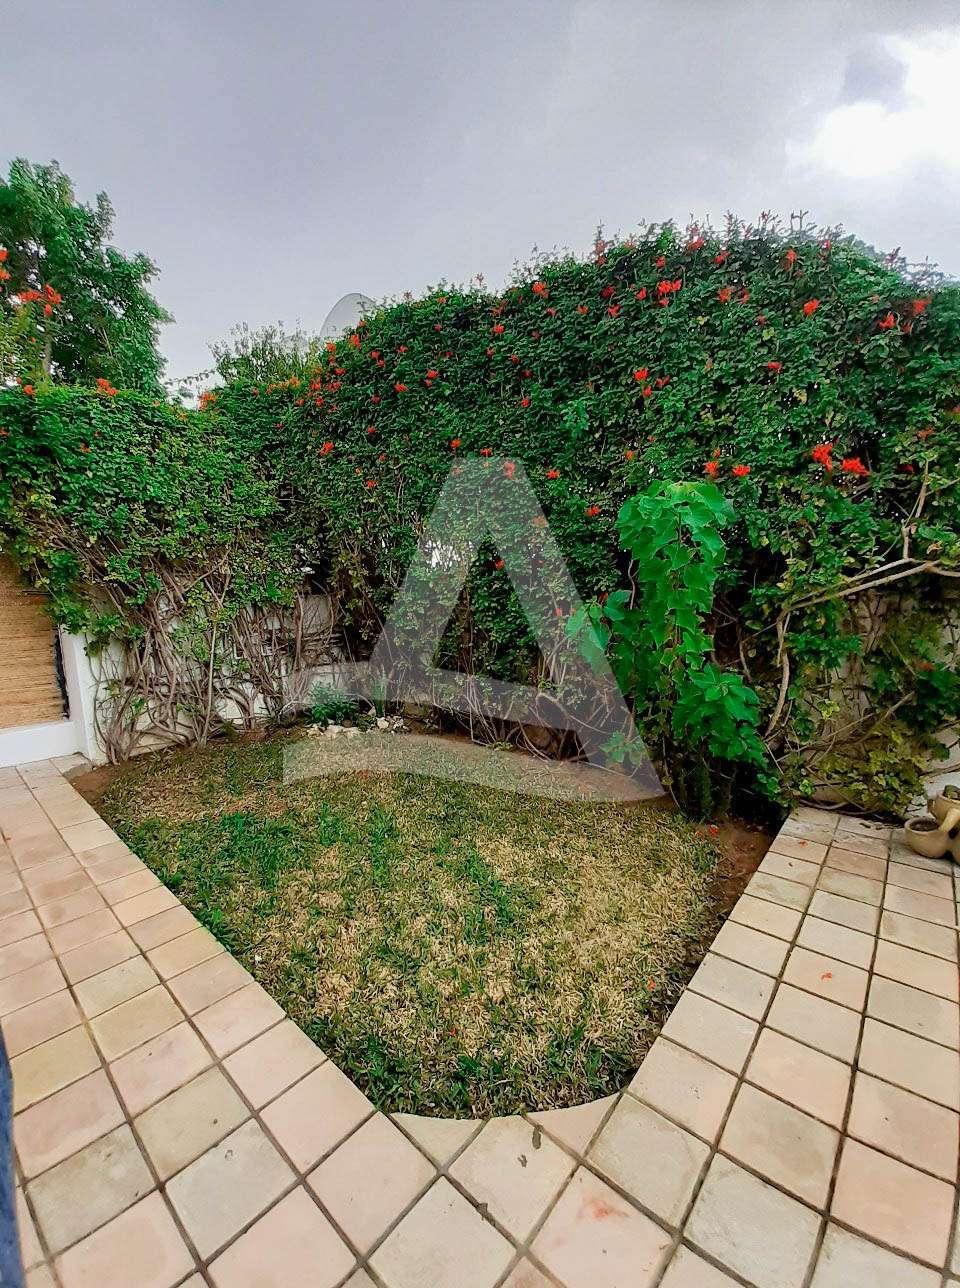 httpss3.amazonaws.comlogimoaws17073511691602854316Appartement_Marsa_Tunisie_-7